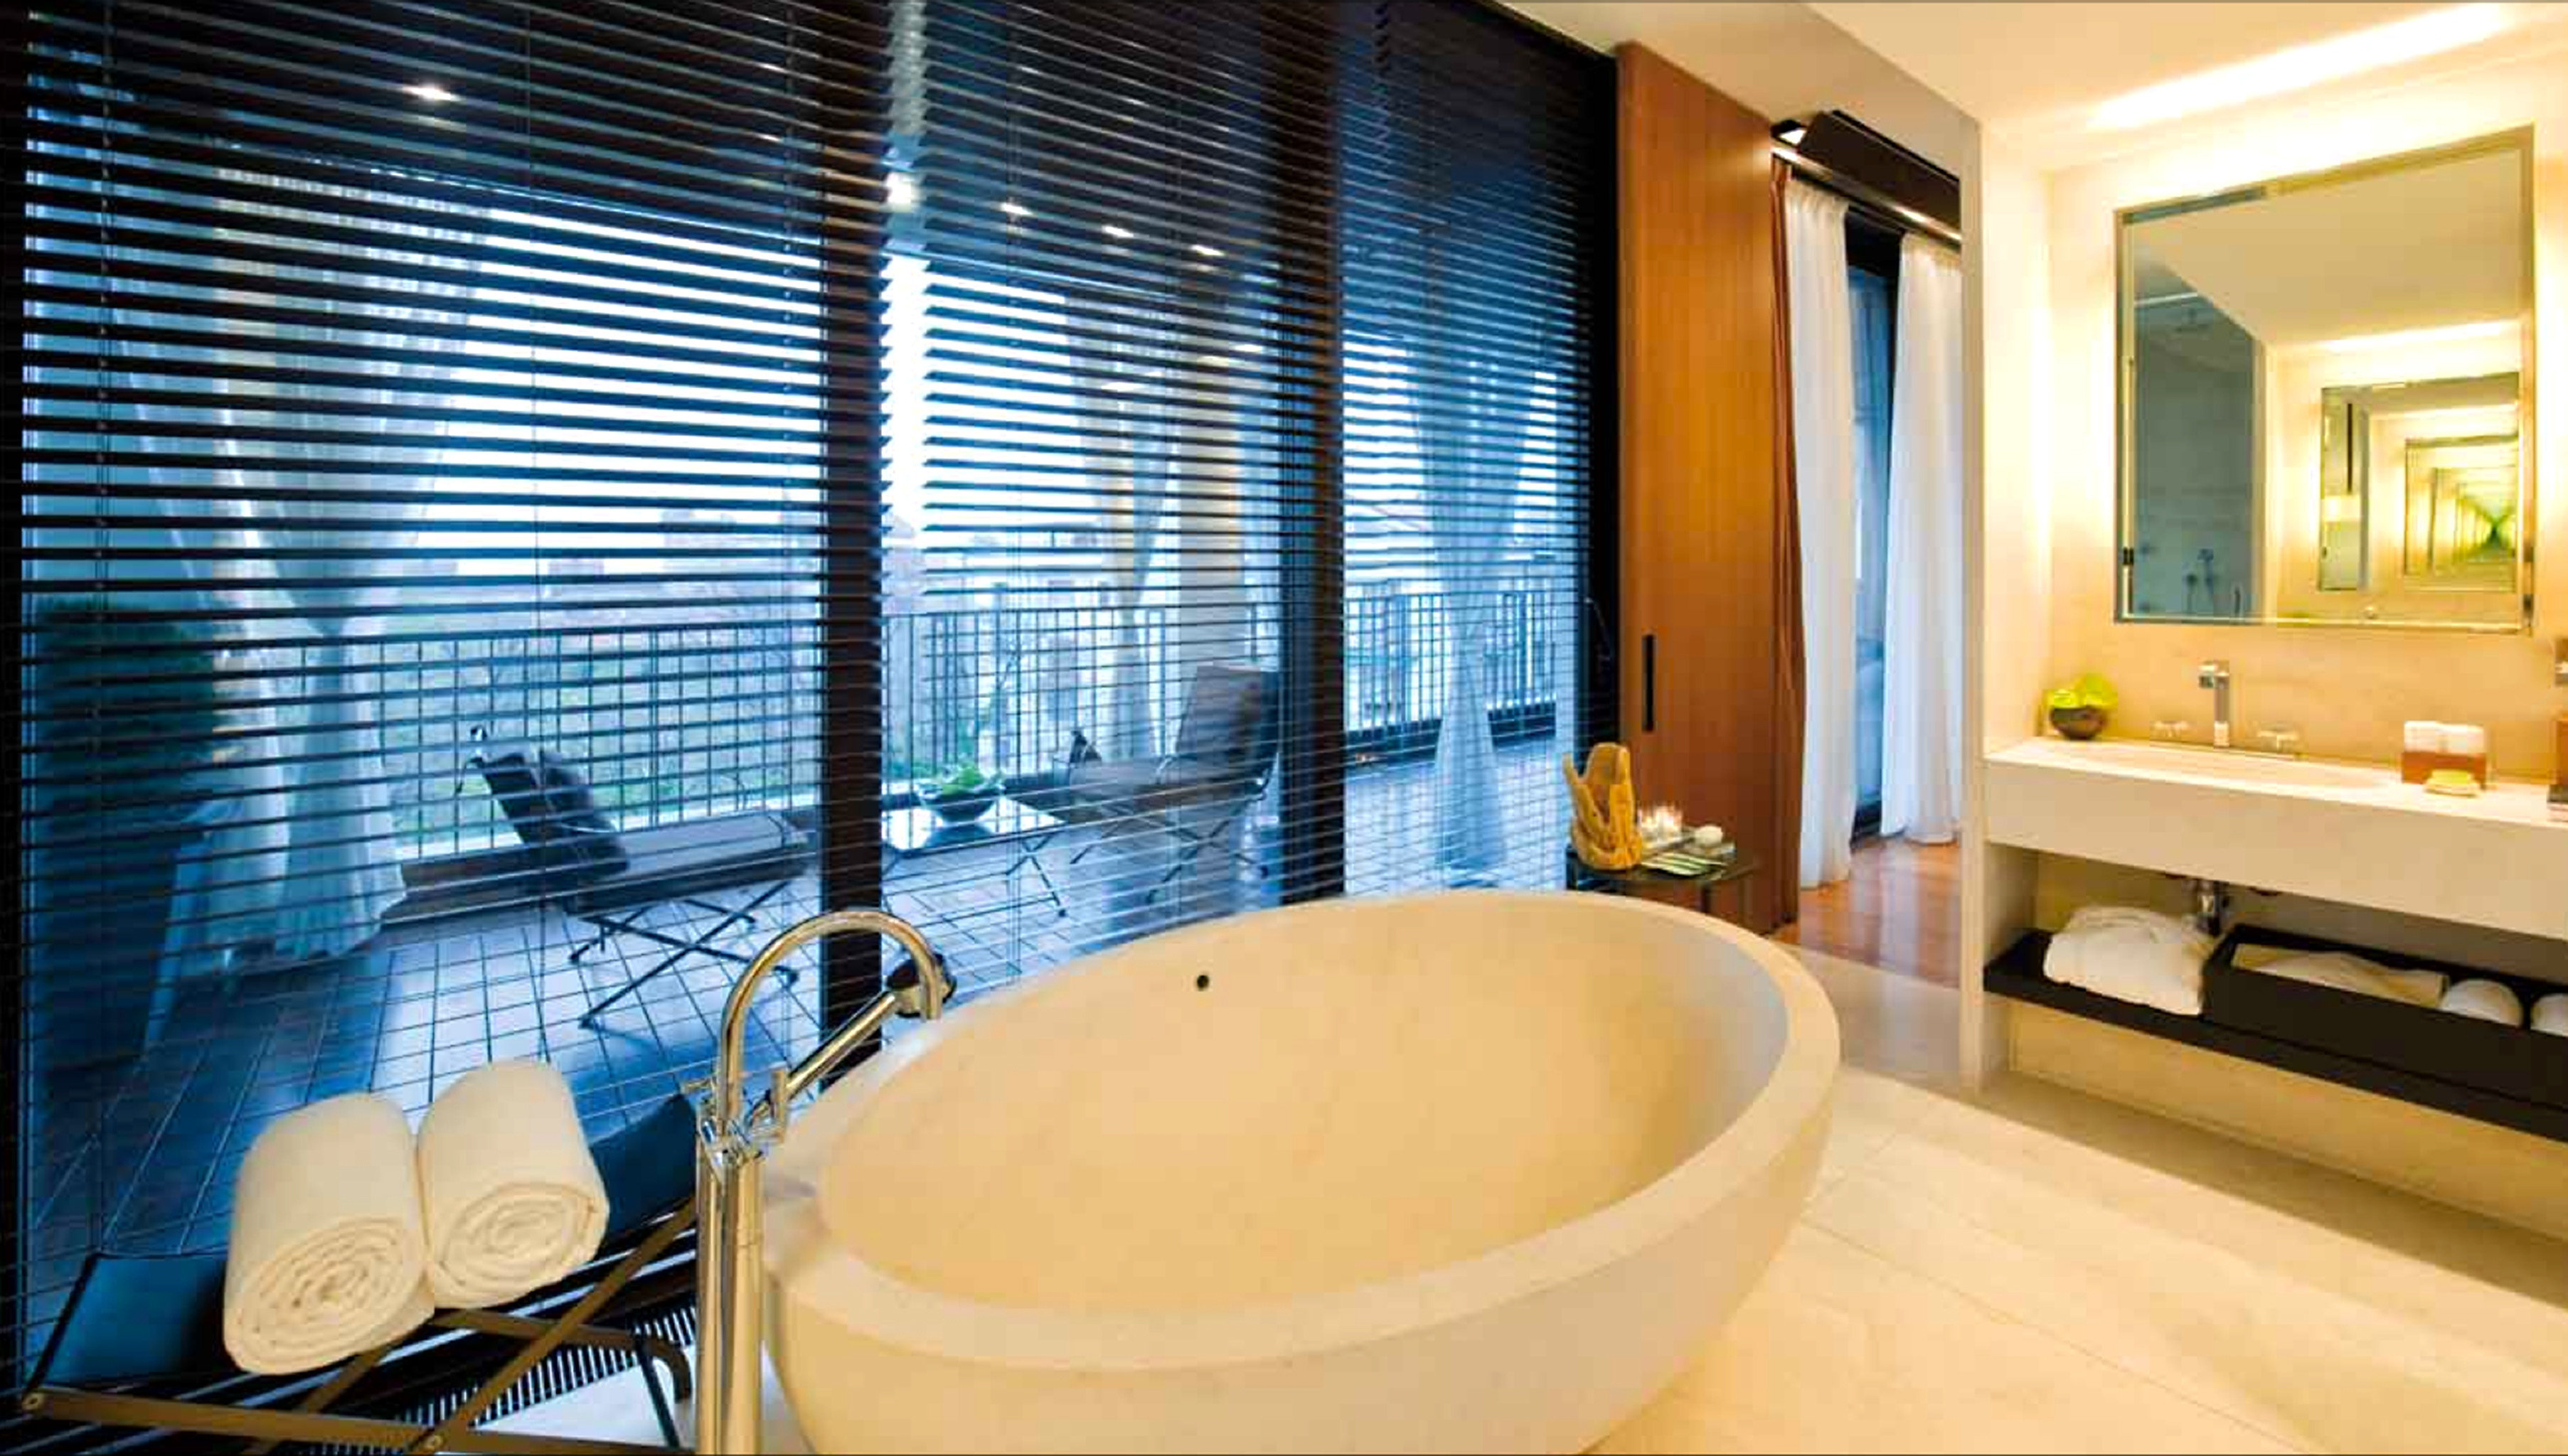 Bath Luxury Modern bathroom tub swimming pool property bathtub Suite sink tiled